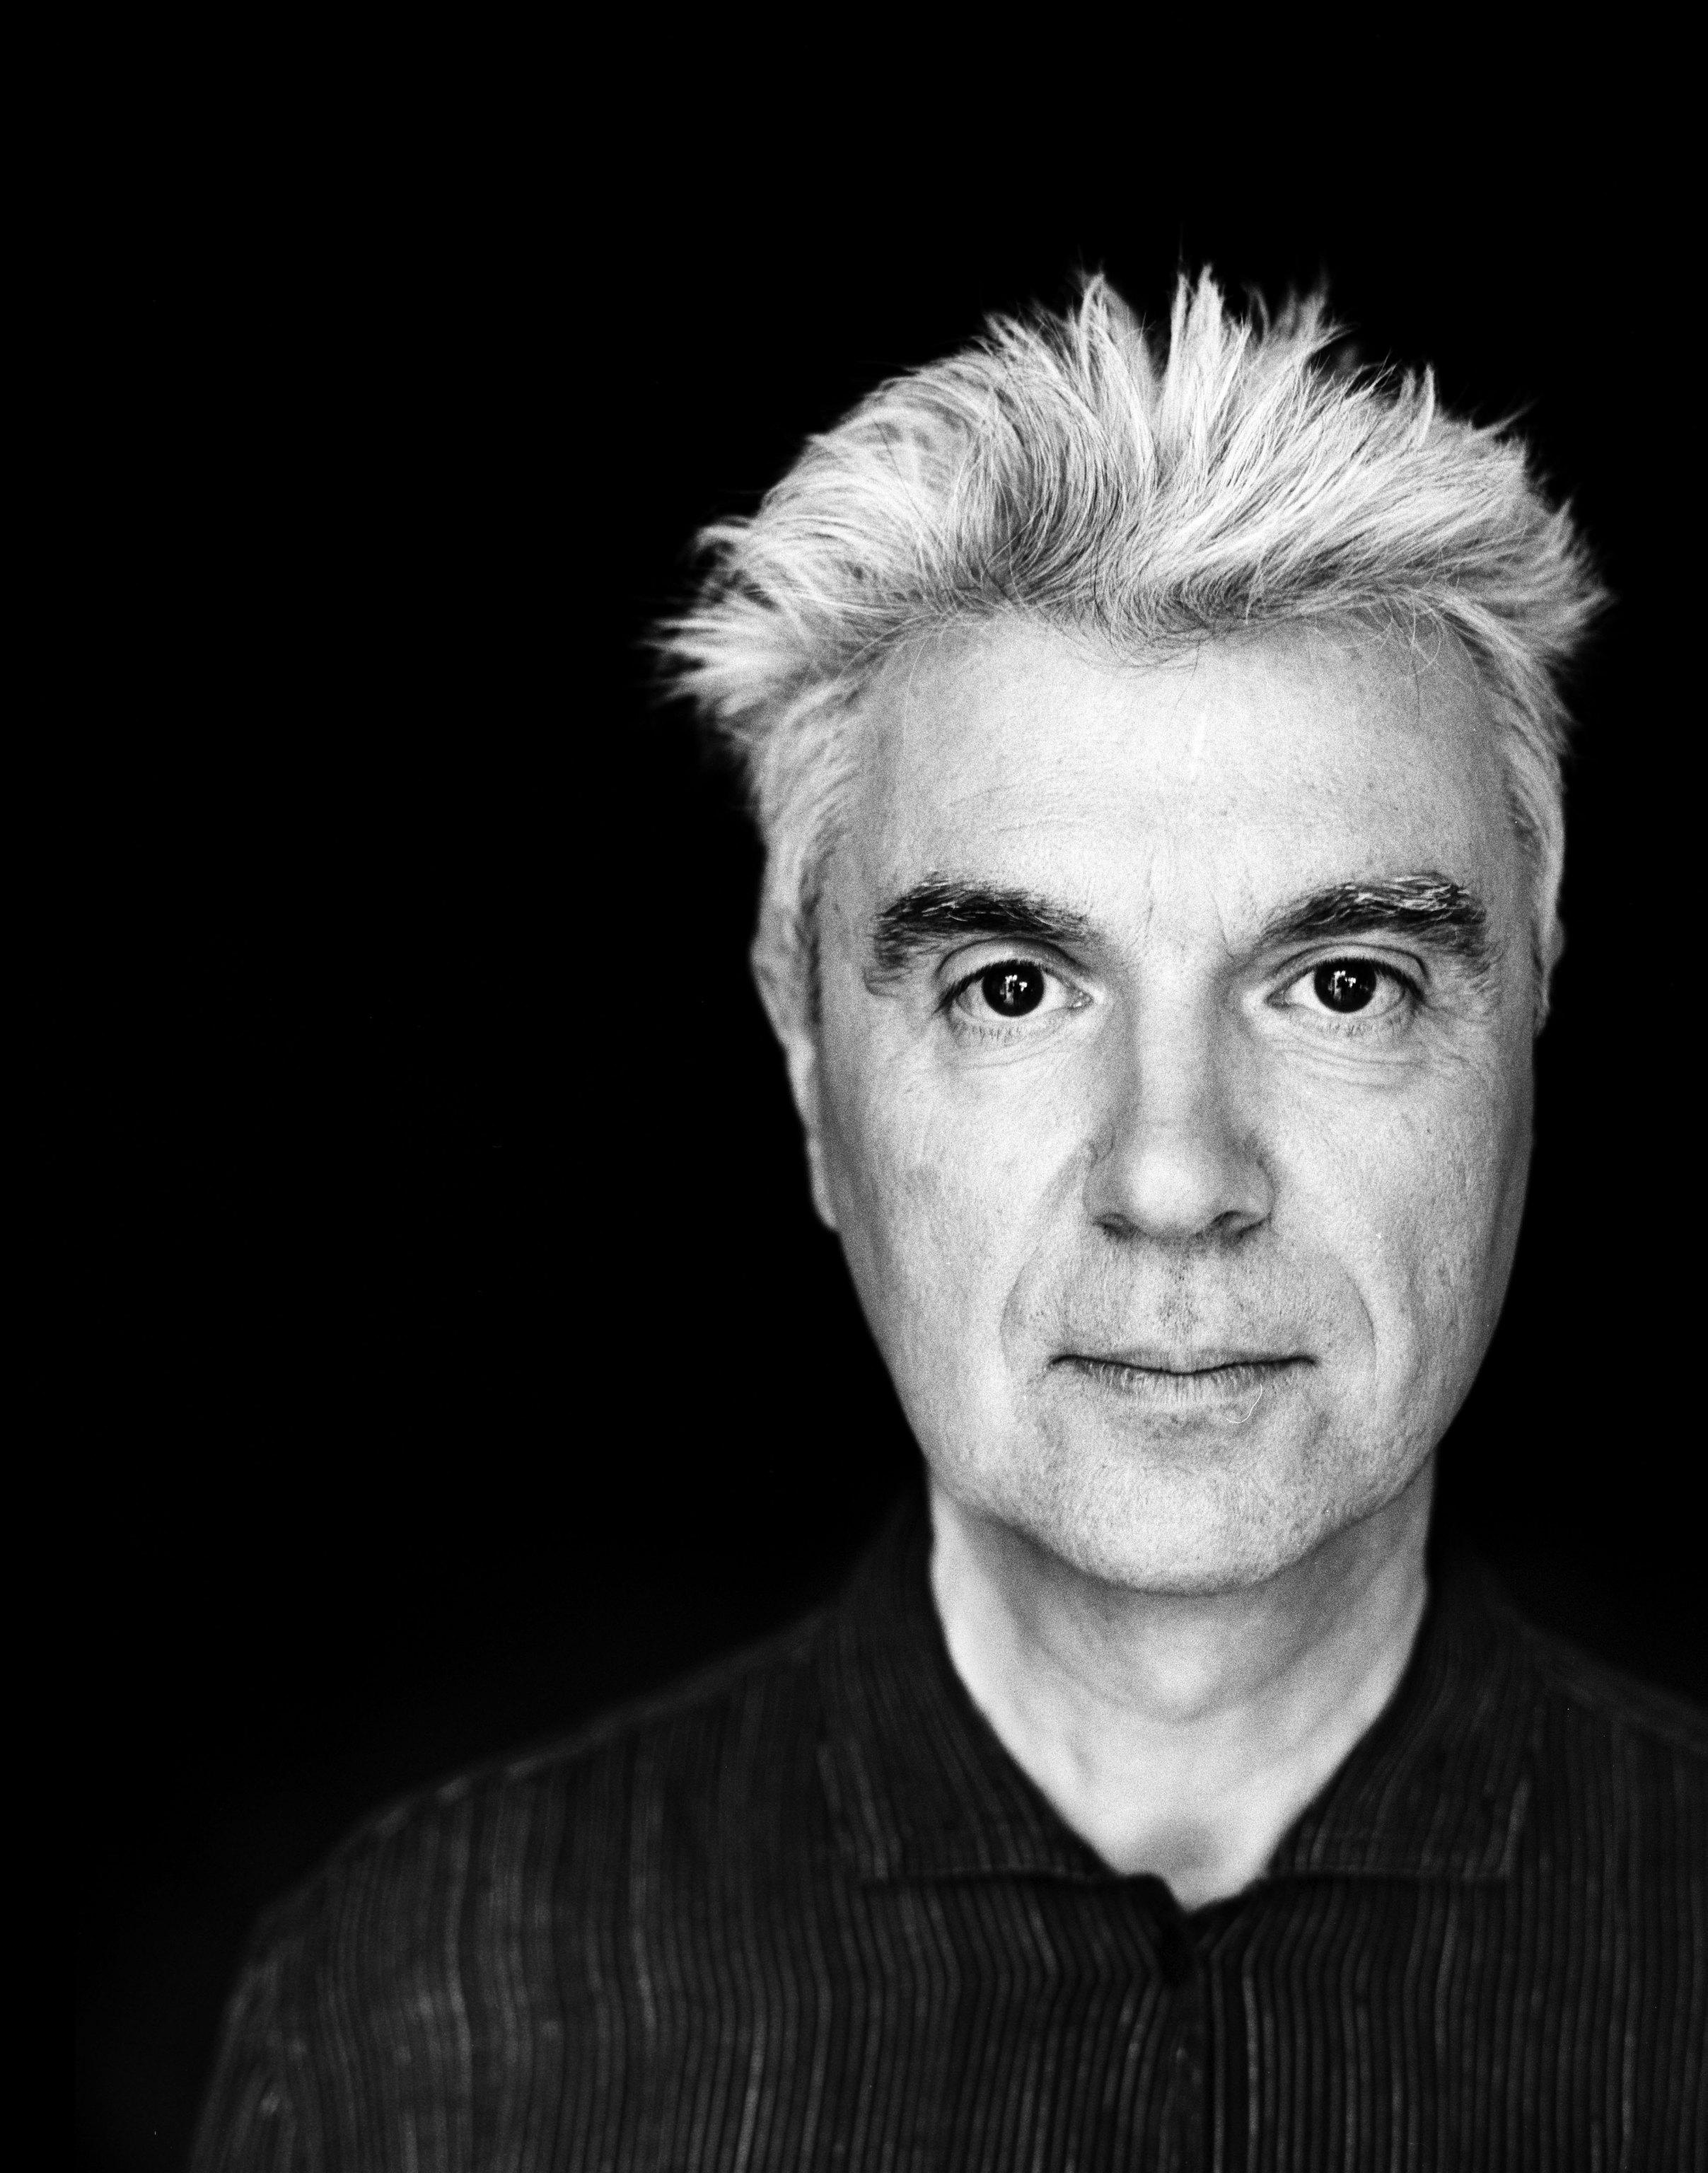 Byrne a Umbria jazz il 20 luglio